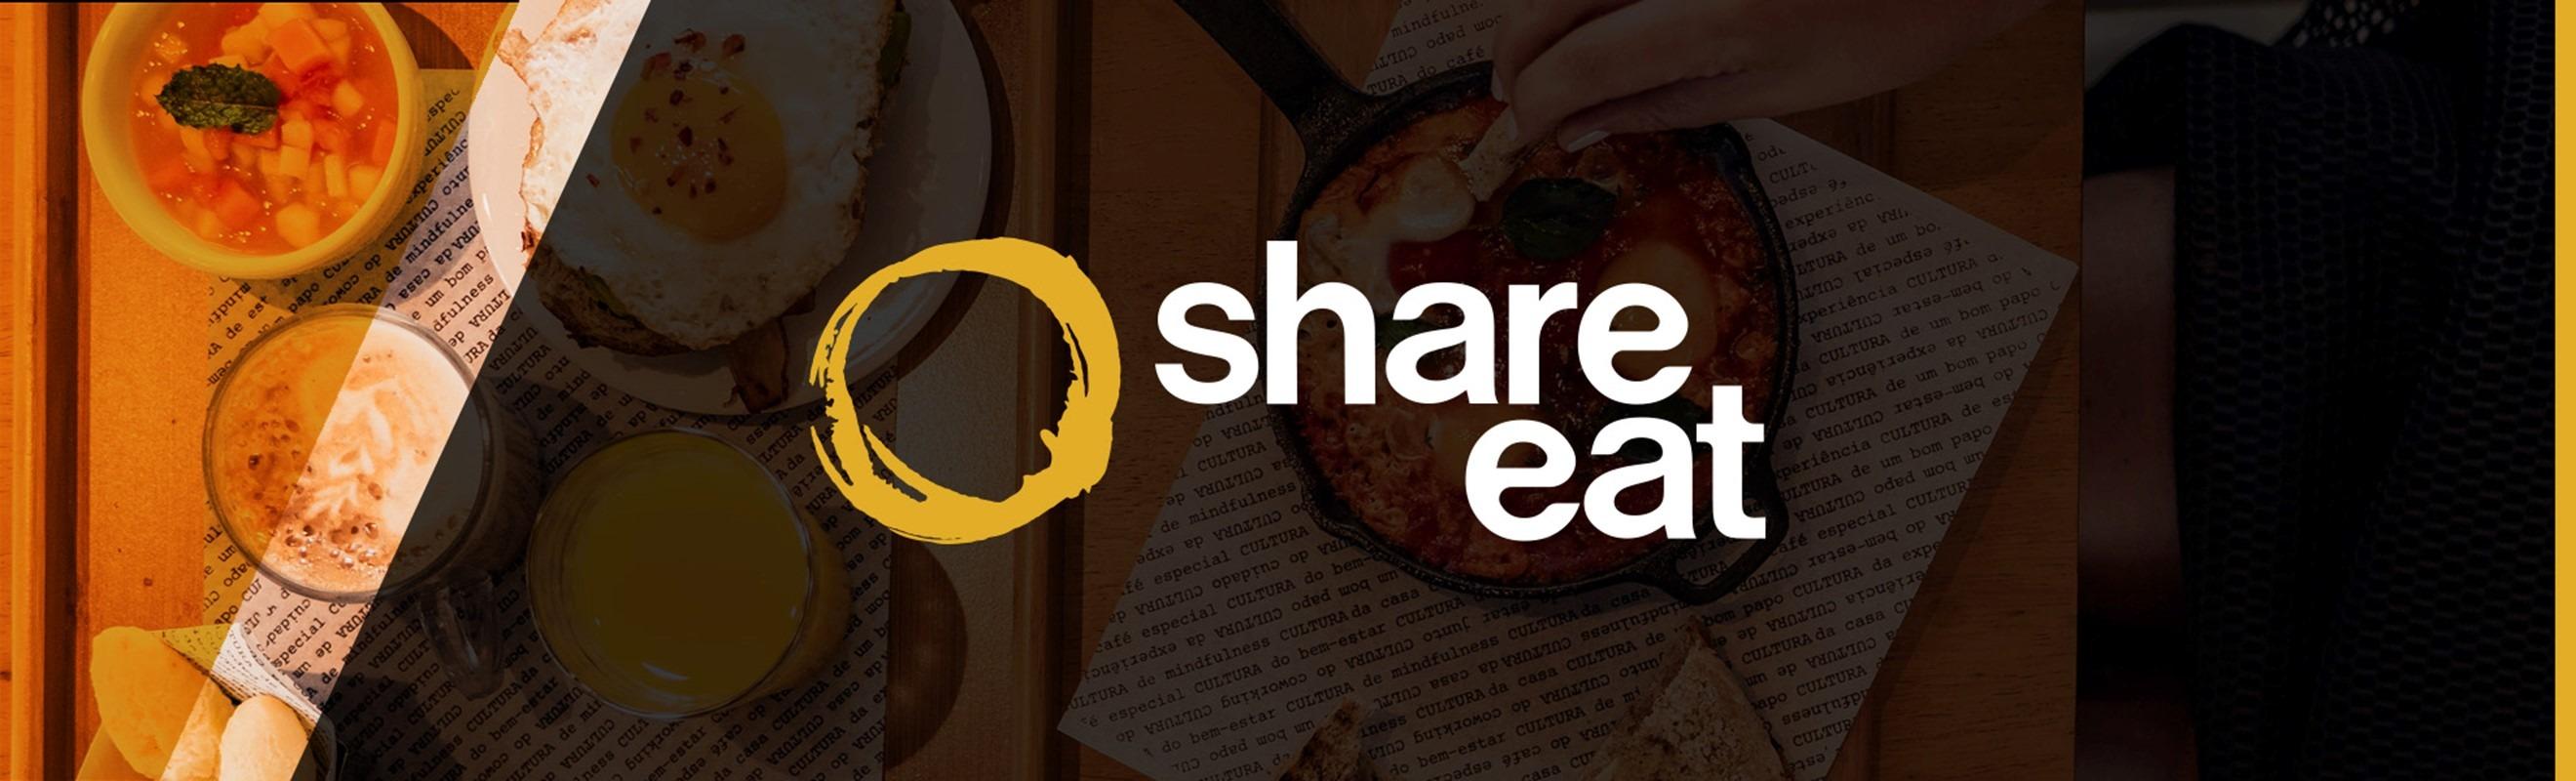 Analista de UX [Share eat]